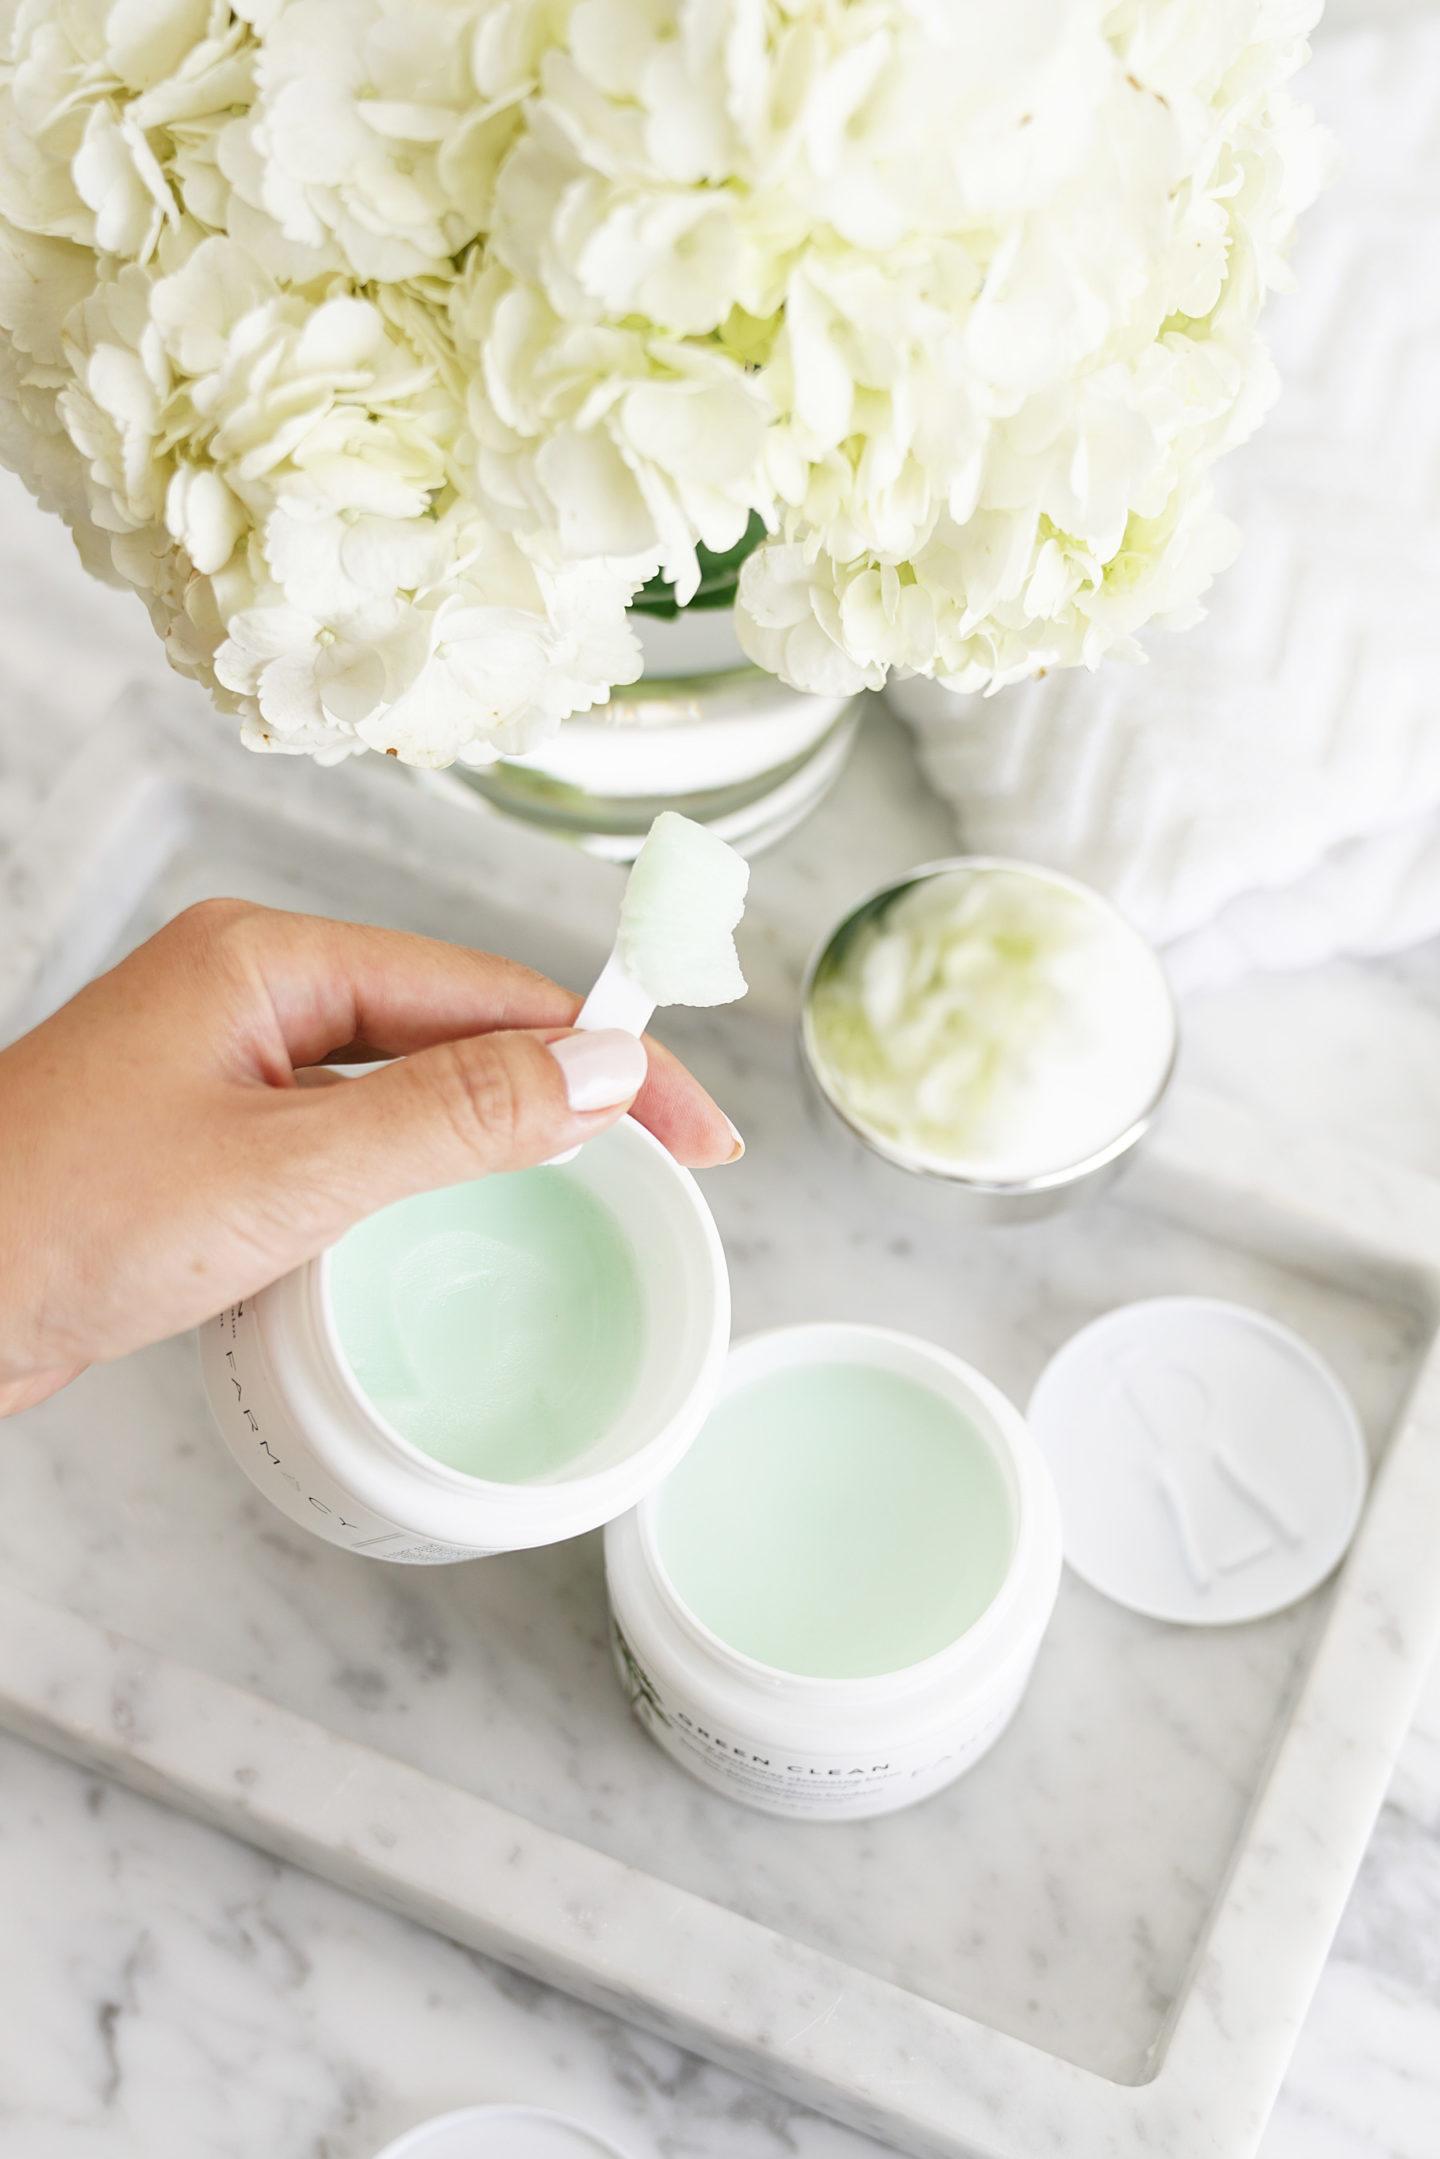 Revitalisant Meltaway Baume nettoyant vert Clean Beauty